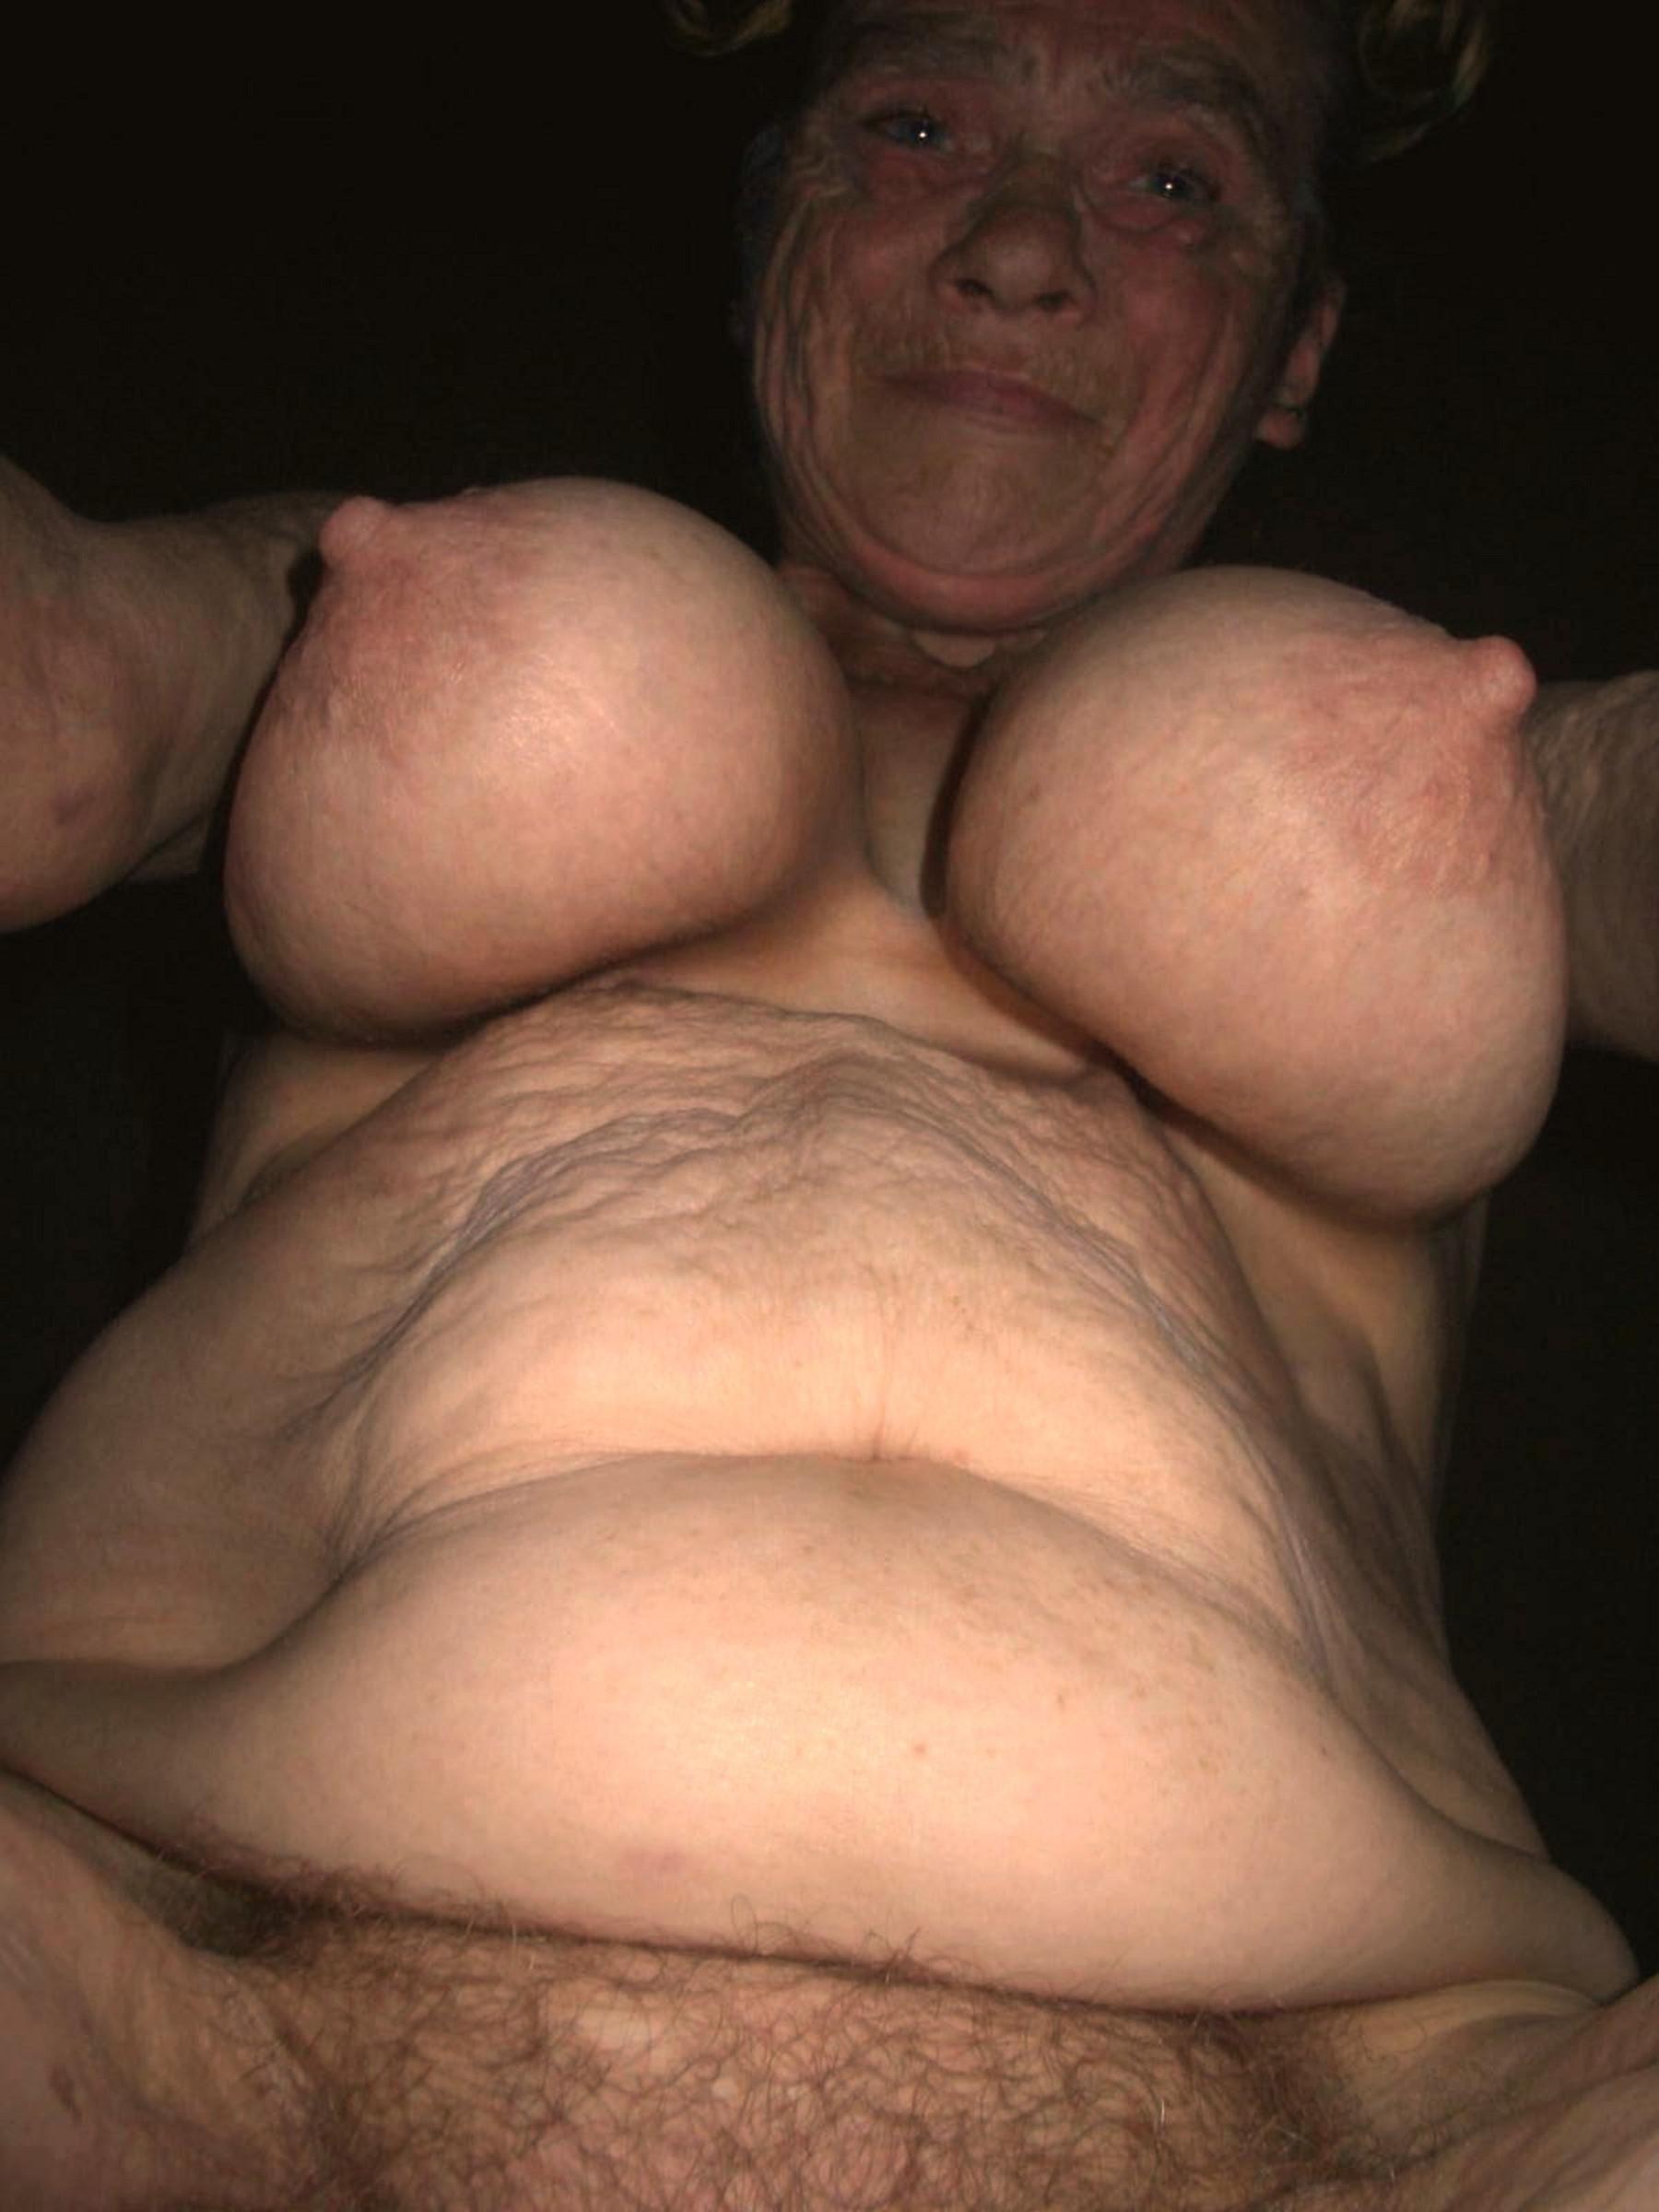 Nipples huge Category:Topless women